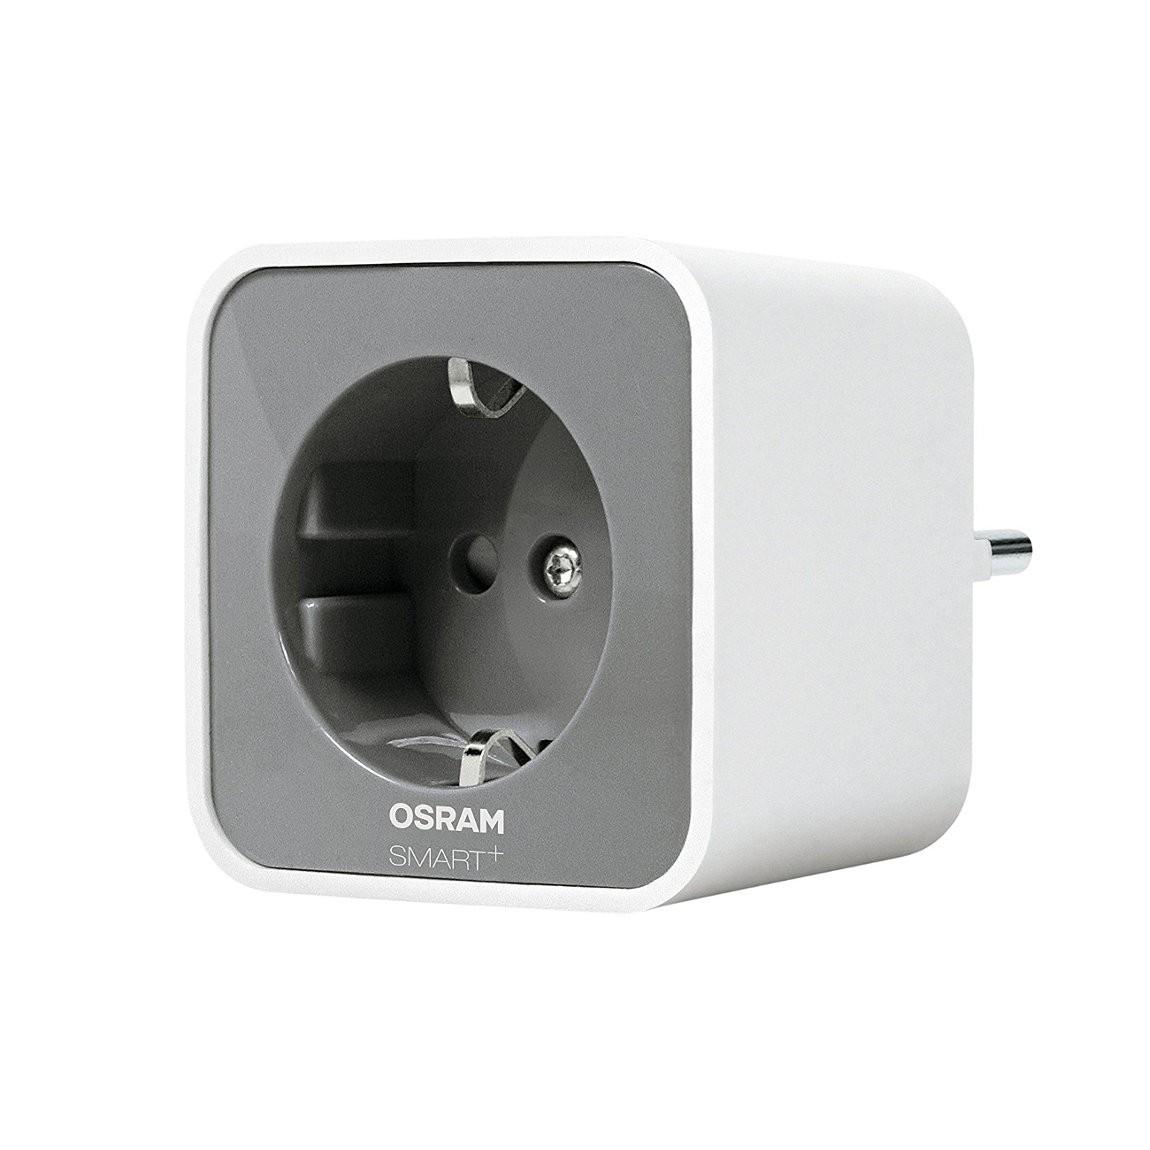 Osram Smart+ Plug - smarte Steckdose - Weiß